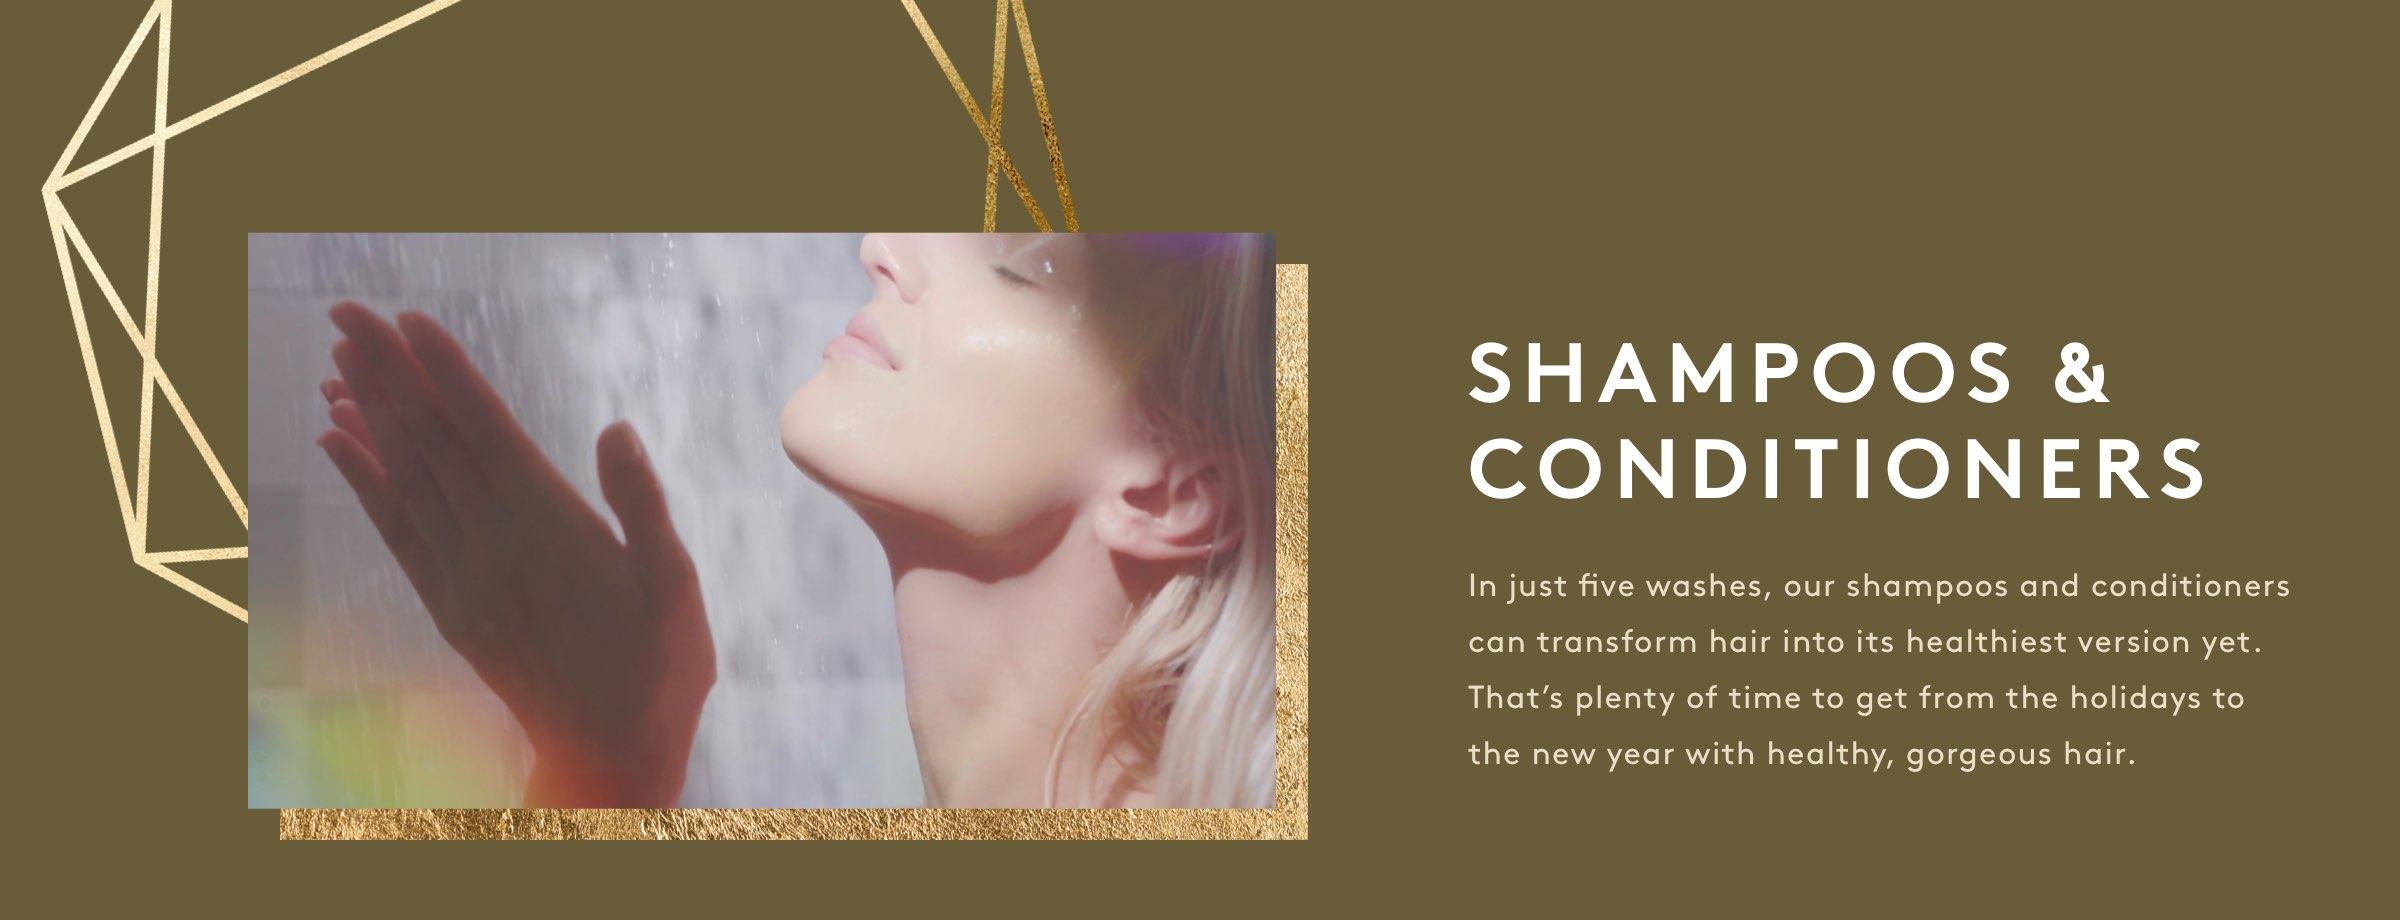 Shampoos & Conditioners